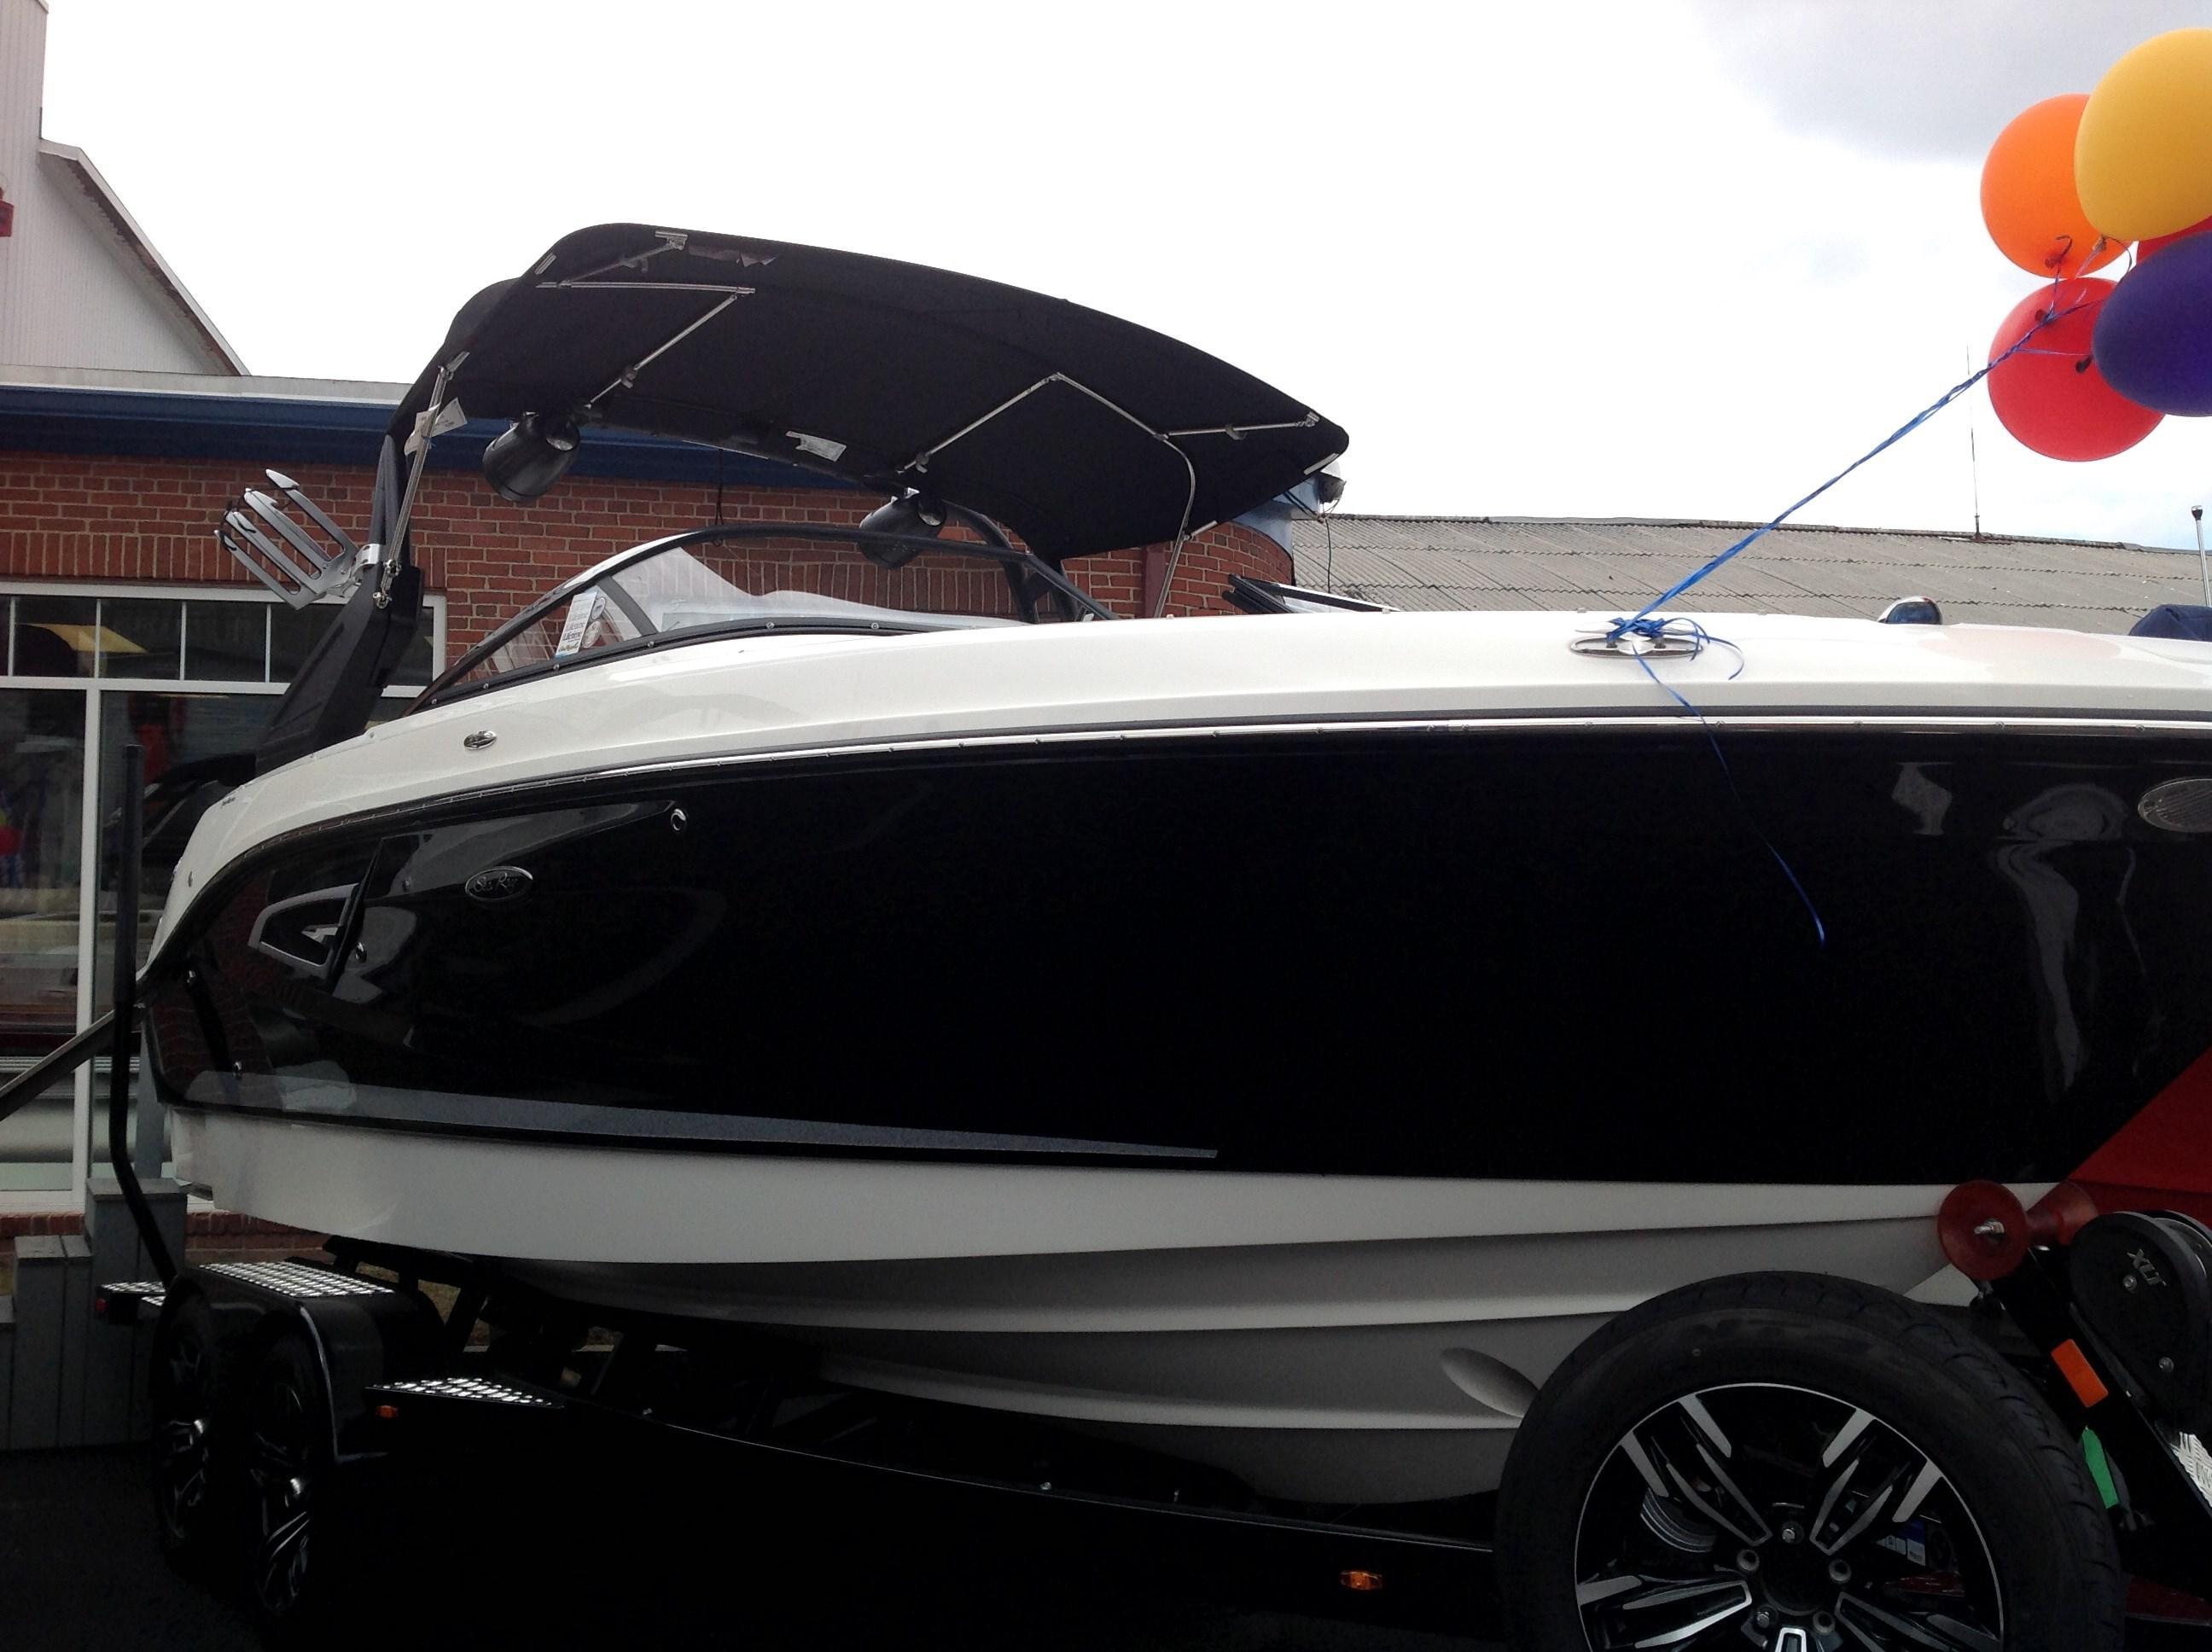 2018 SEA RAY 230 SLX W for sale